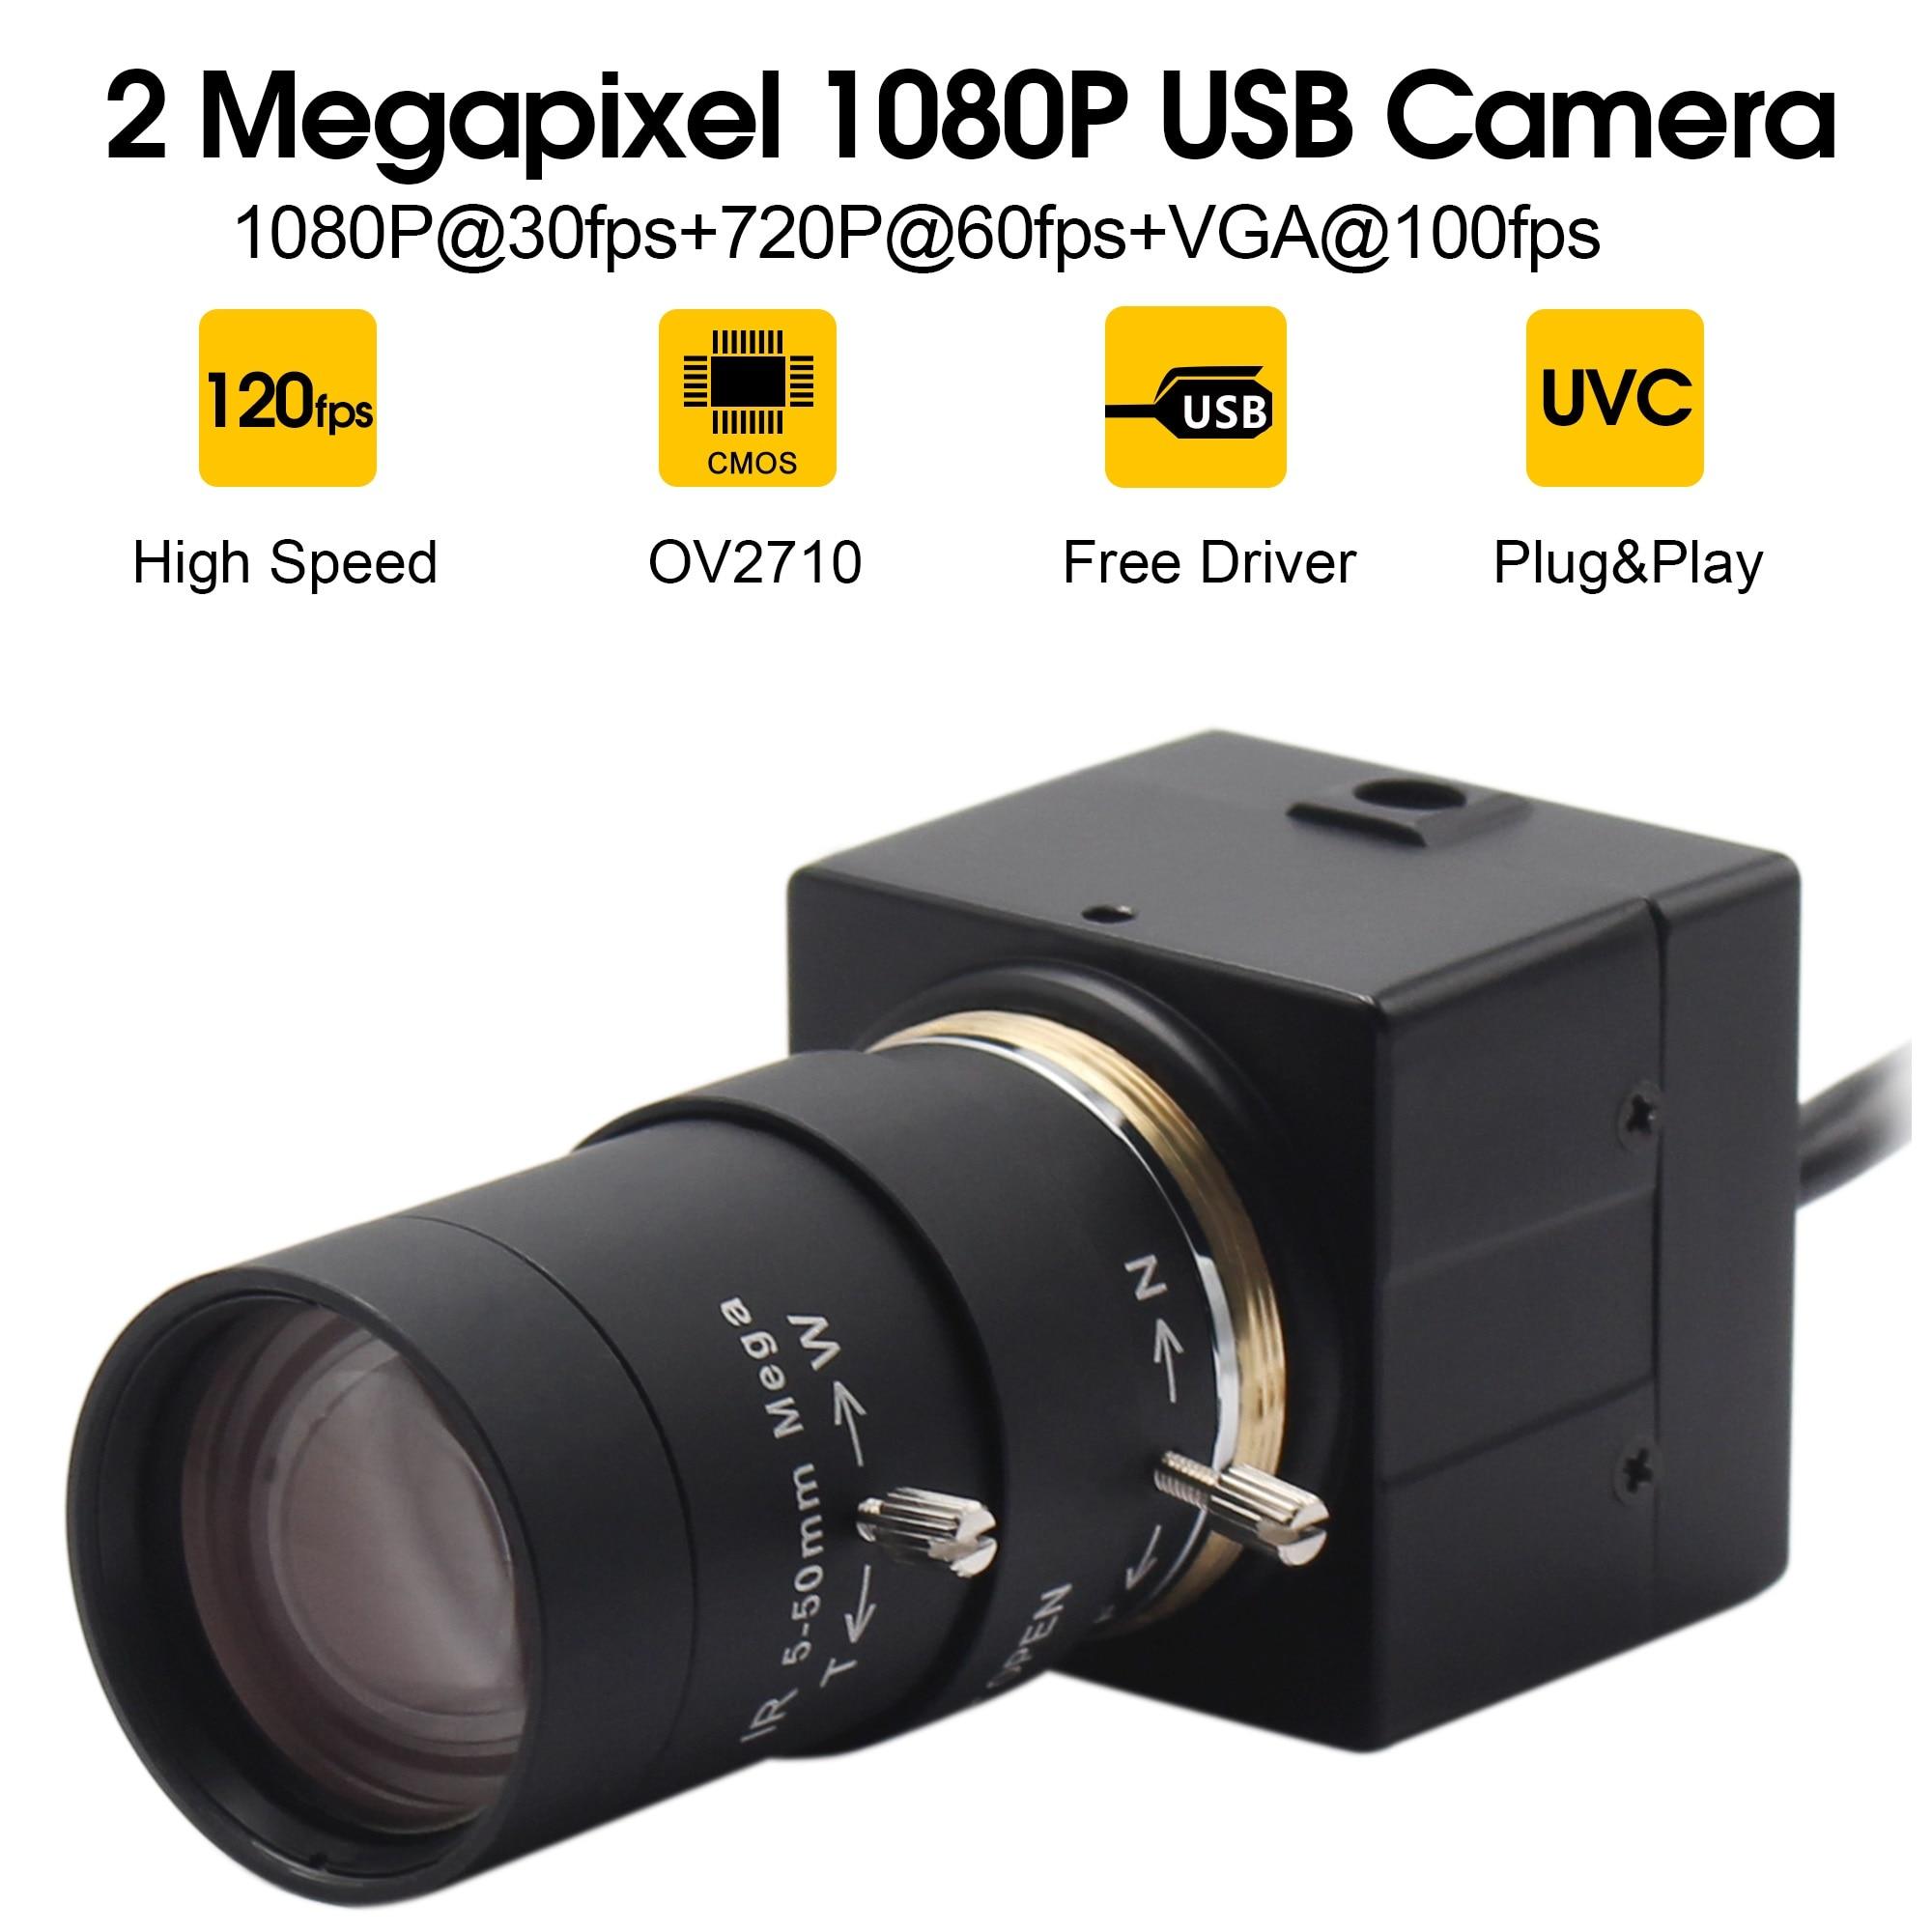 Cámara web USB de 1080P, 5 50mm CS, lente de montaje Varifocus CMOS OV2710 MJPEG 30fps/60fps/120fps, cámara USB para ordenador, PC y portátiles Cámaras web    - AliExpress